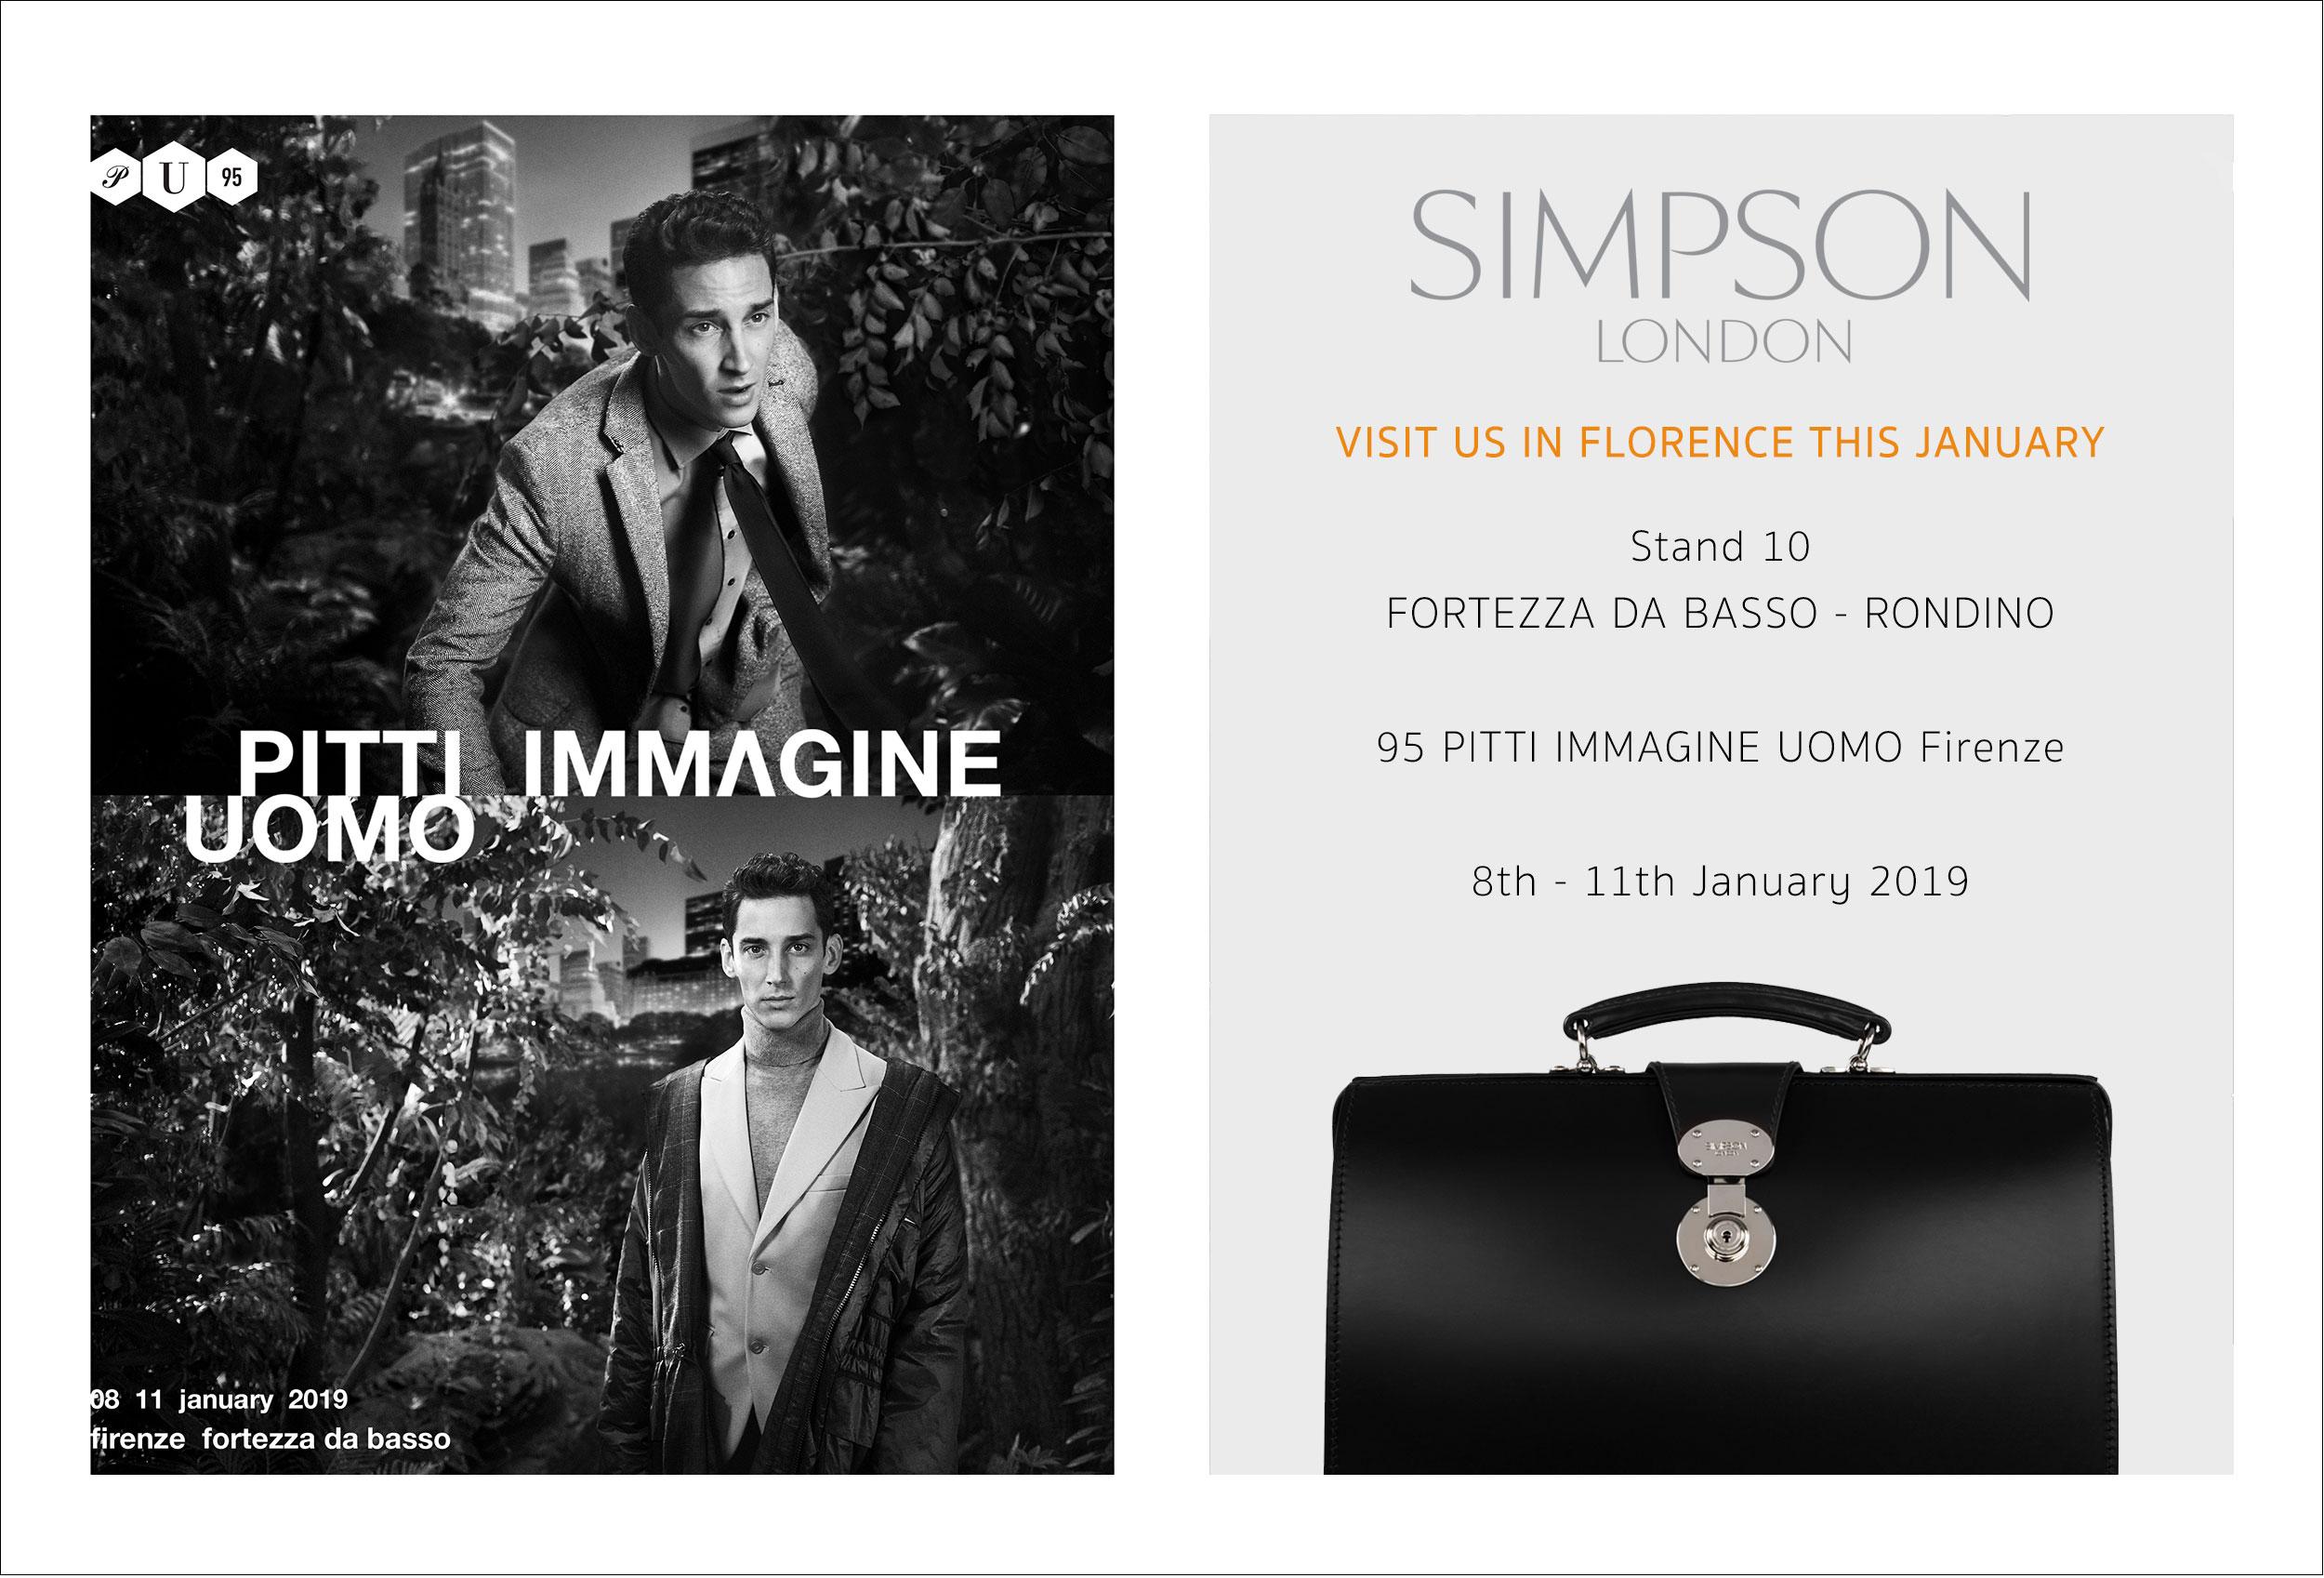 Simpson-pitti-invite-frame.jpg